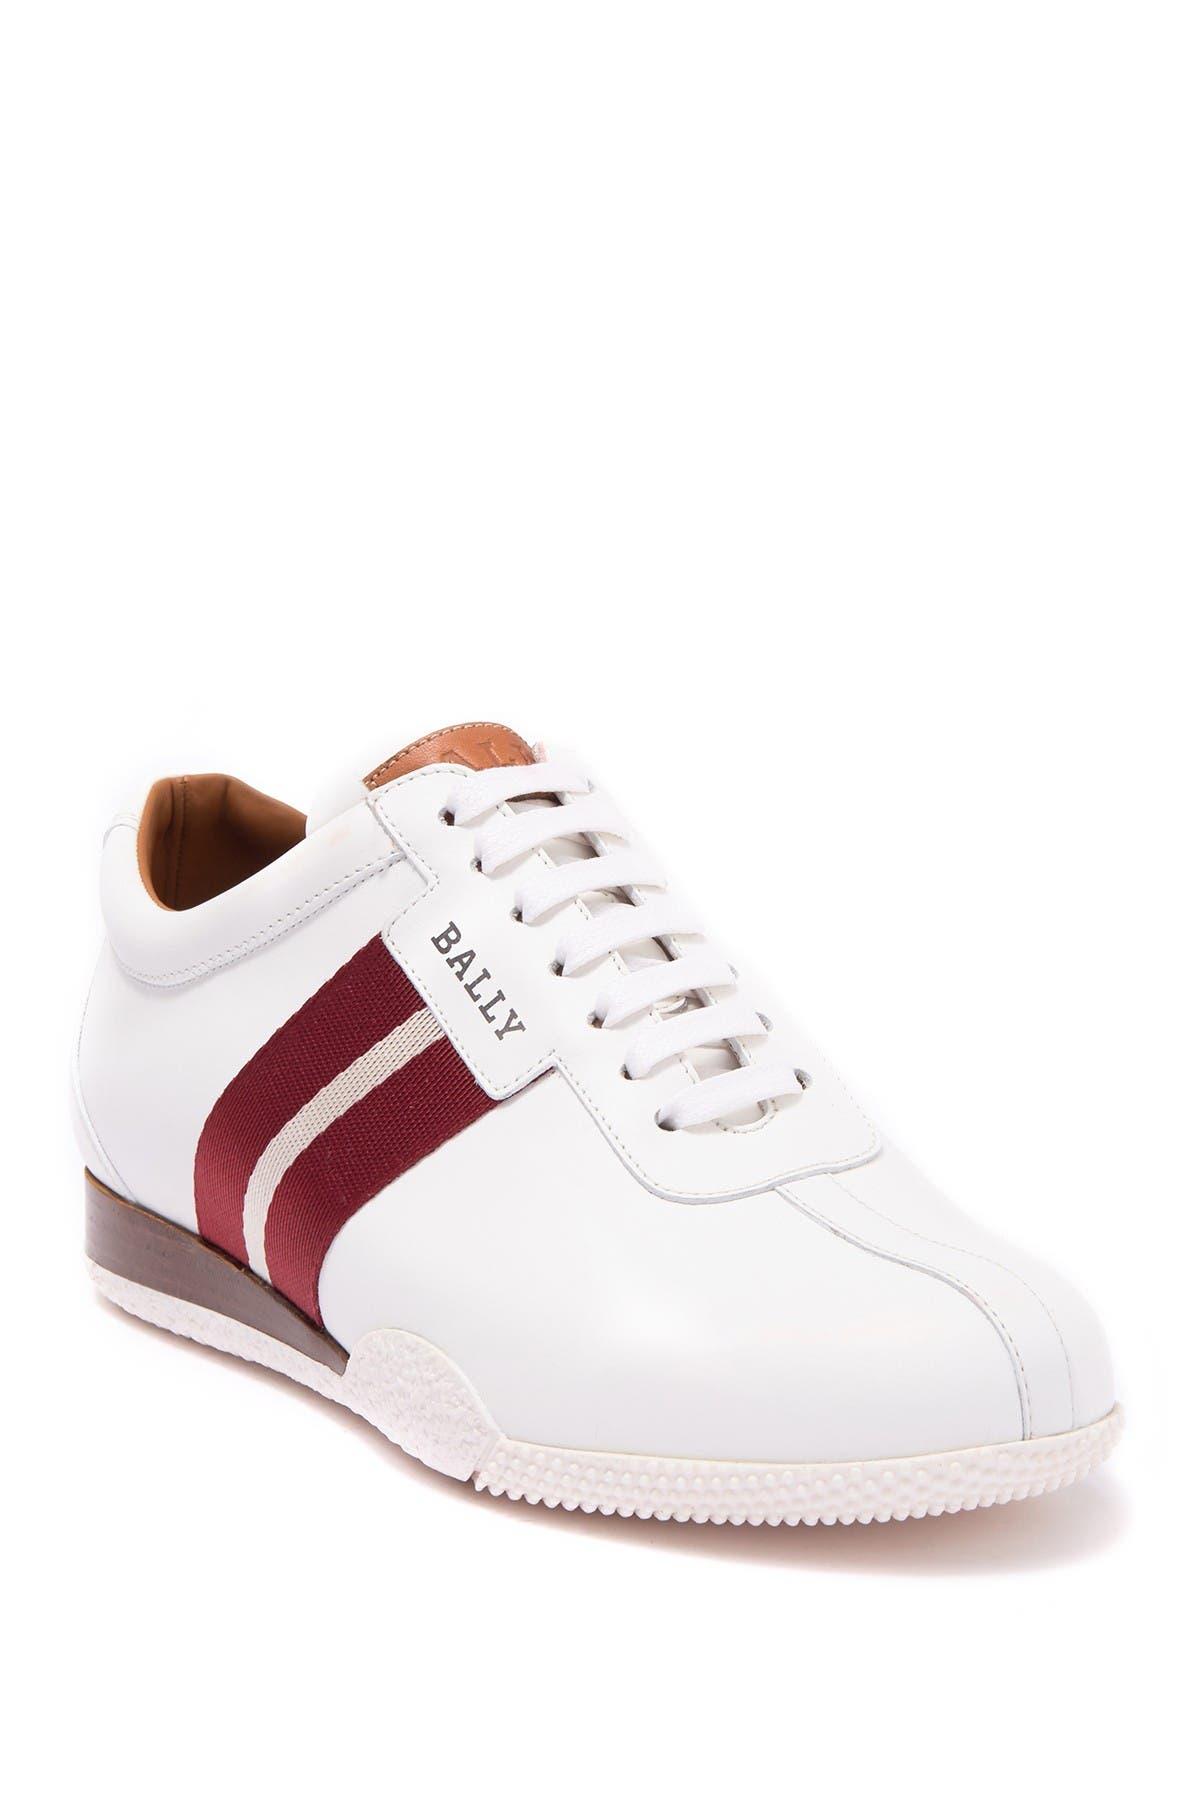 BALLY | Frenz-New-O 507 Sneakers